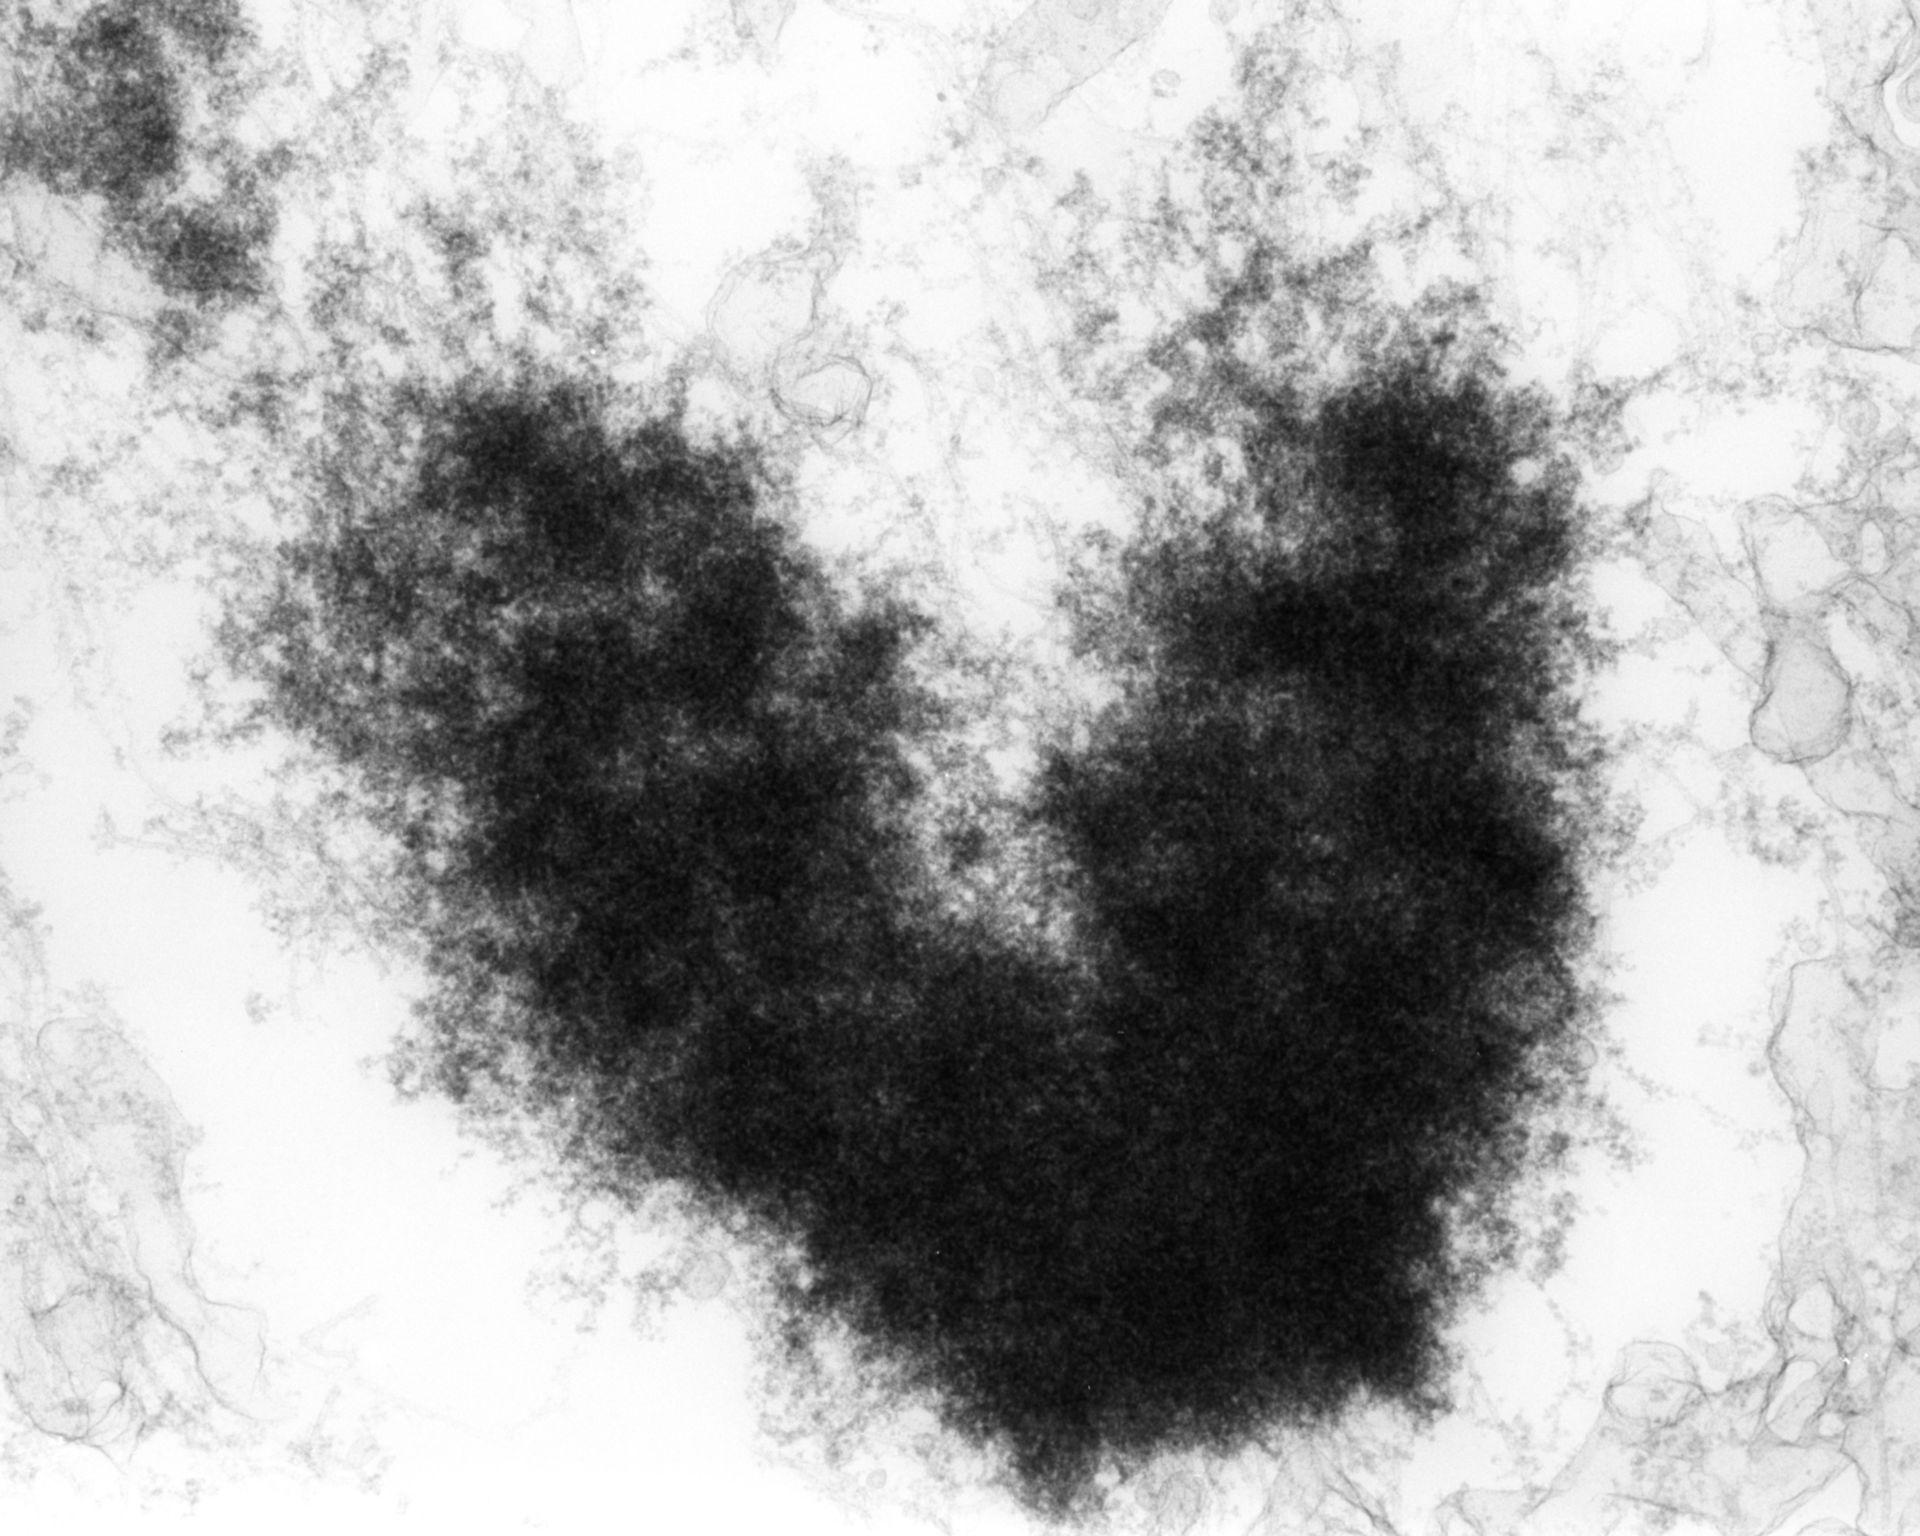 Haemanthus katharinae (Nuclear chromosome) - CIL:11850